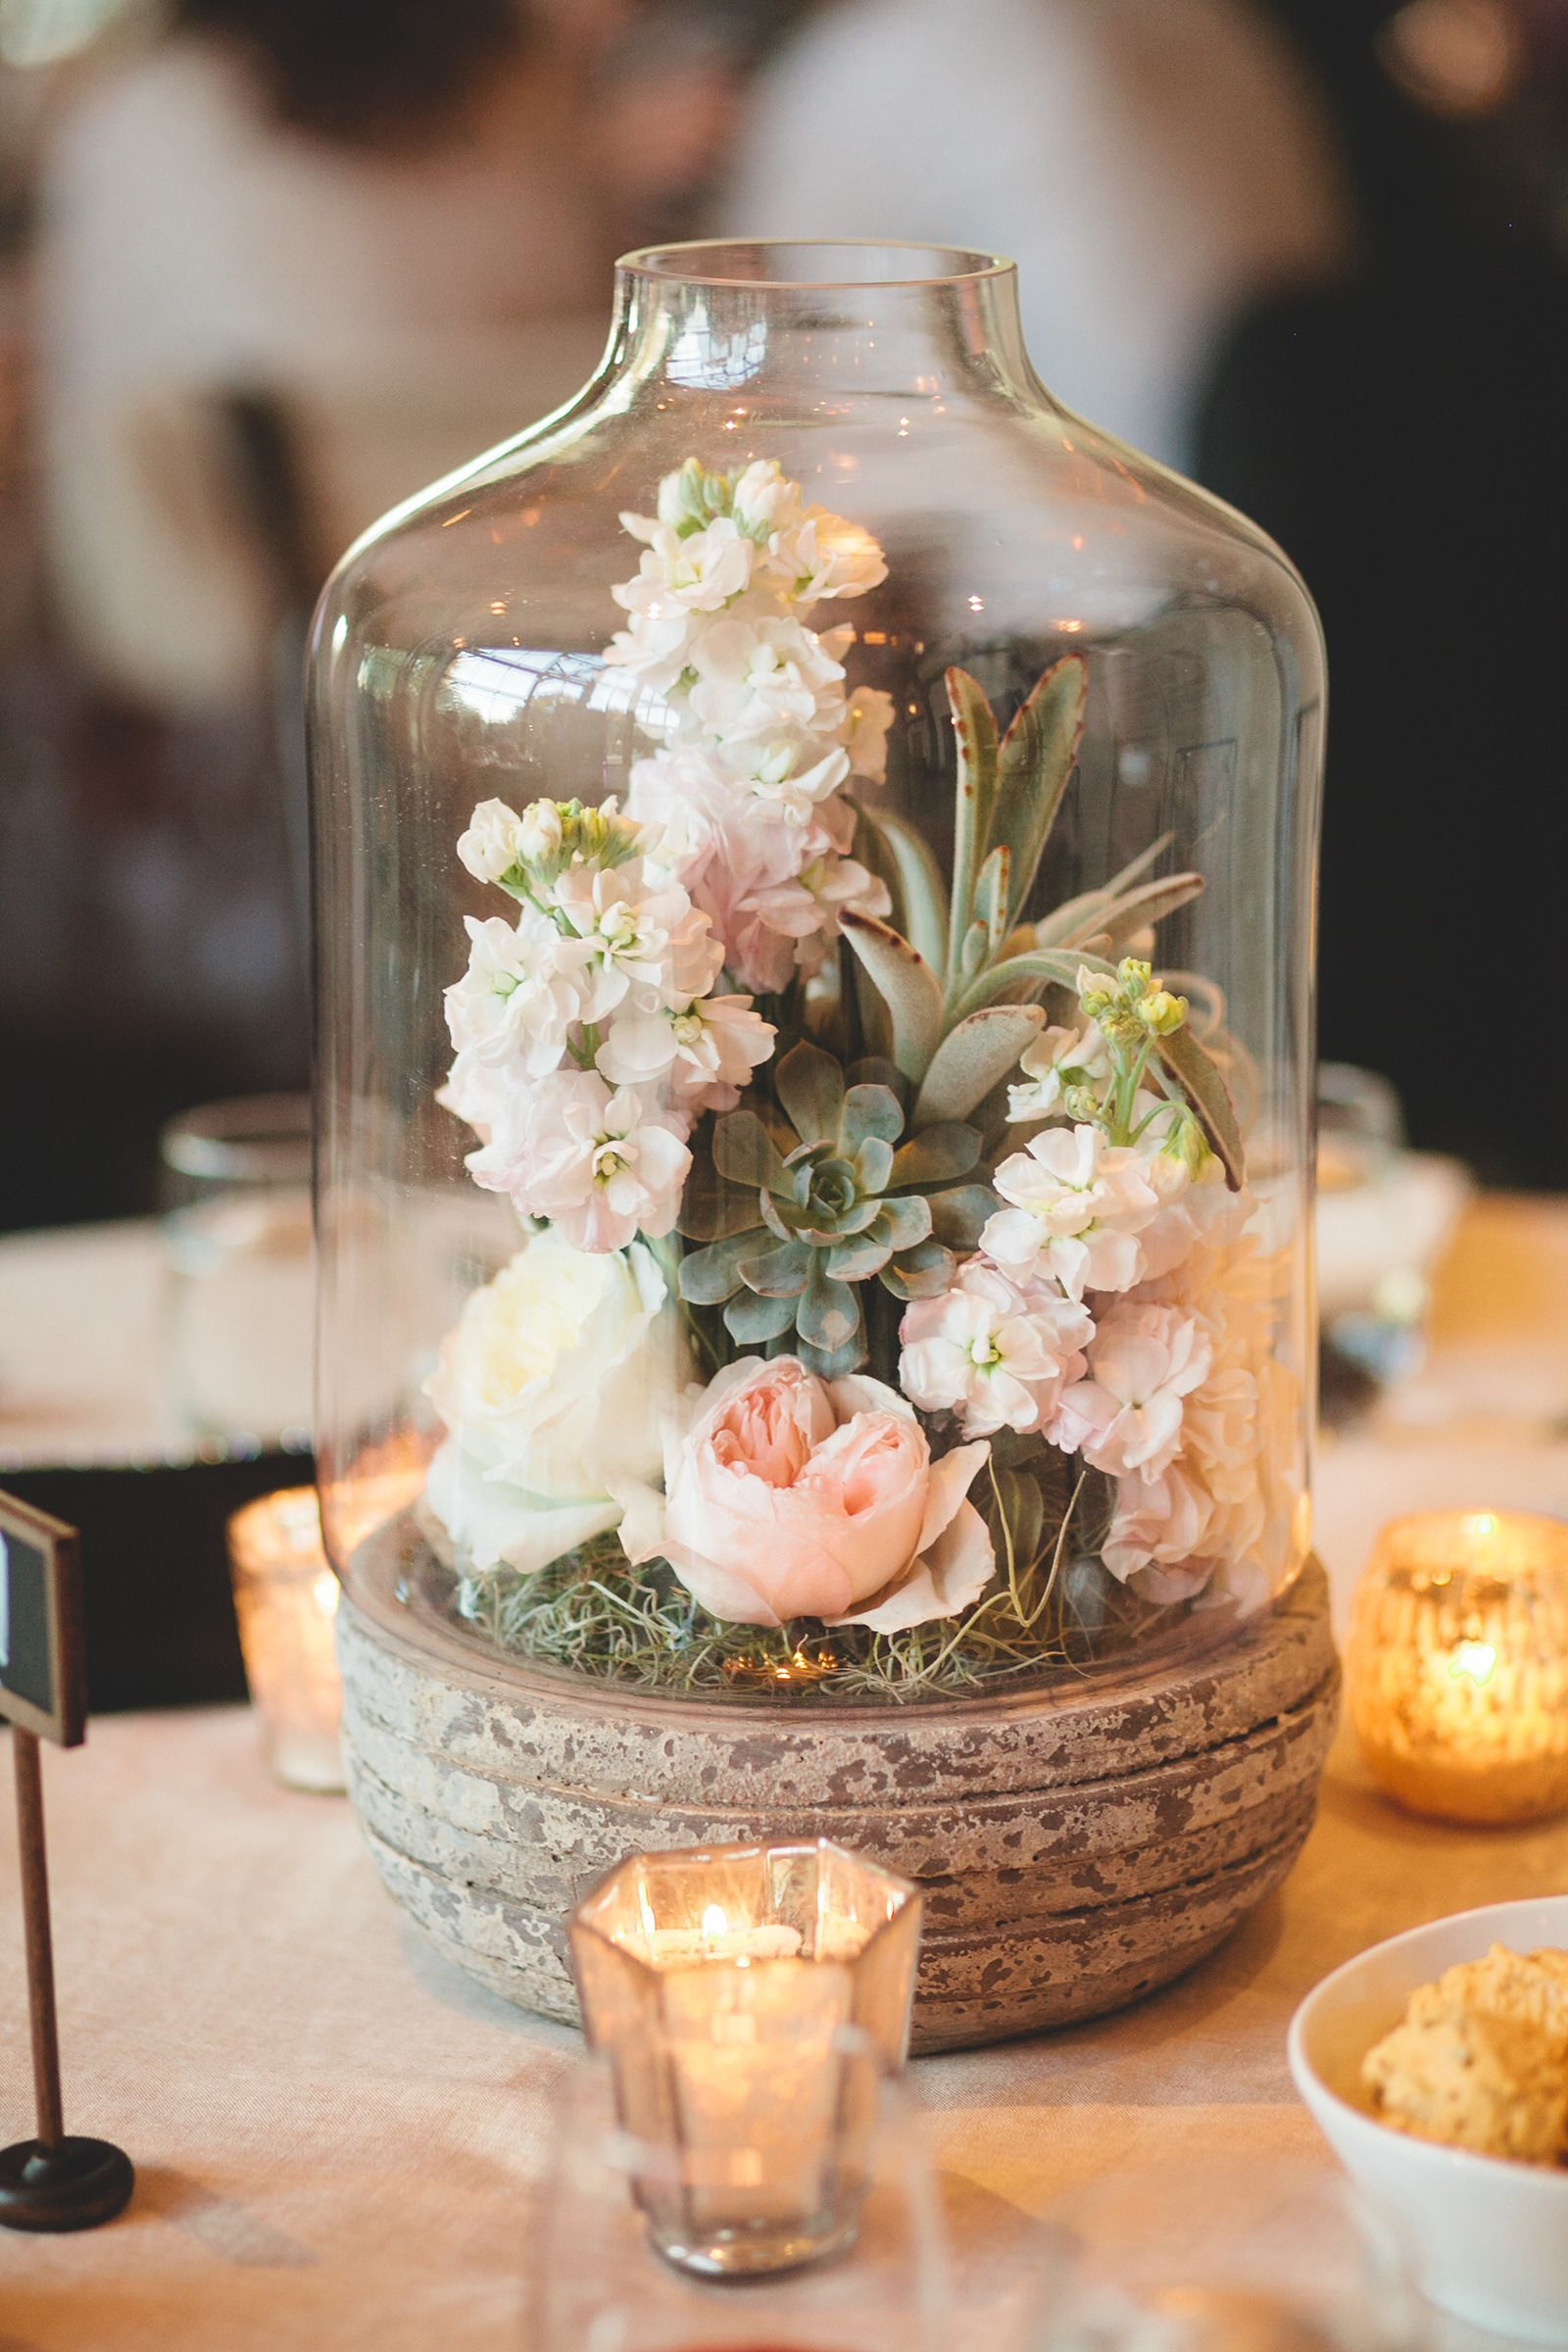 Cheap Wedding Table Centerpiece Ideas Terrarium Wedding Terrarium Wedding Centerpiece Affordable Wedding Centerpieces